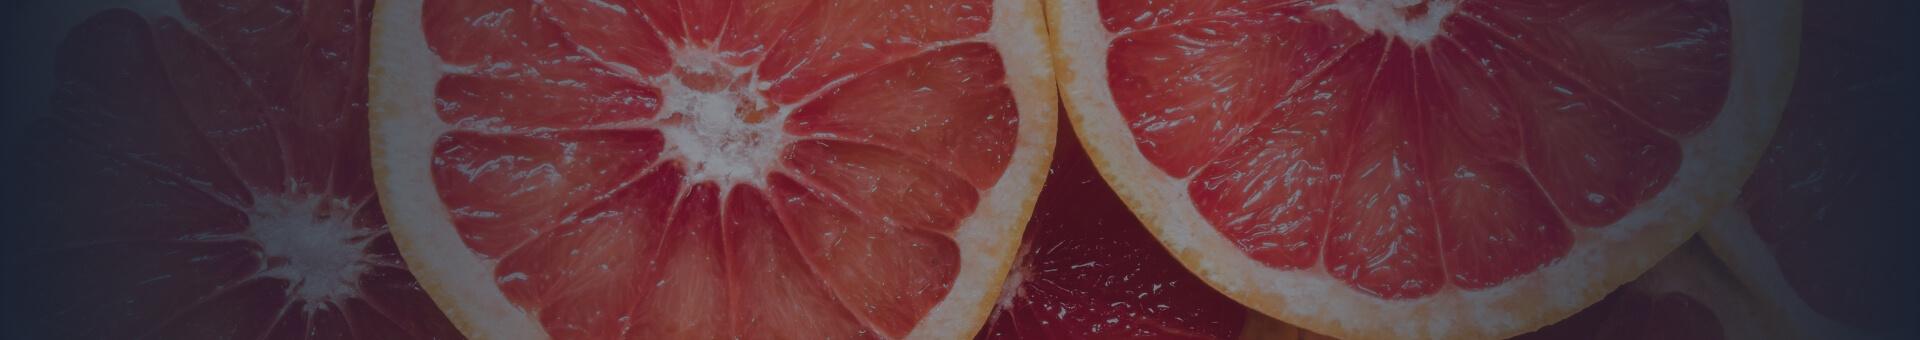 Eat Grapefruit